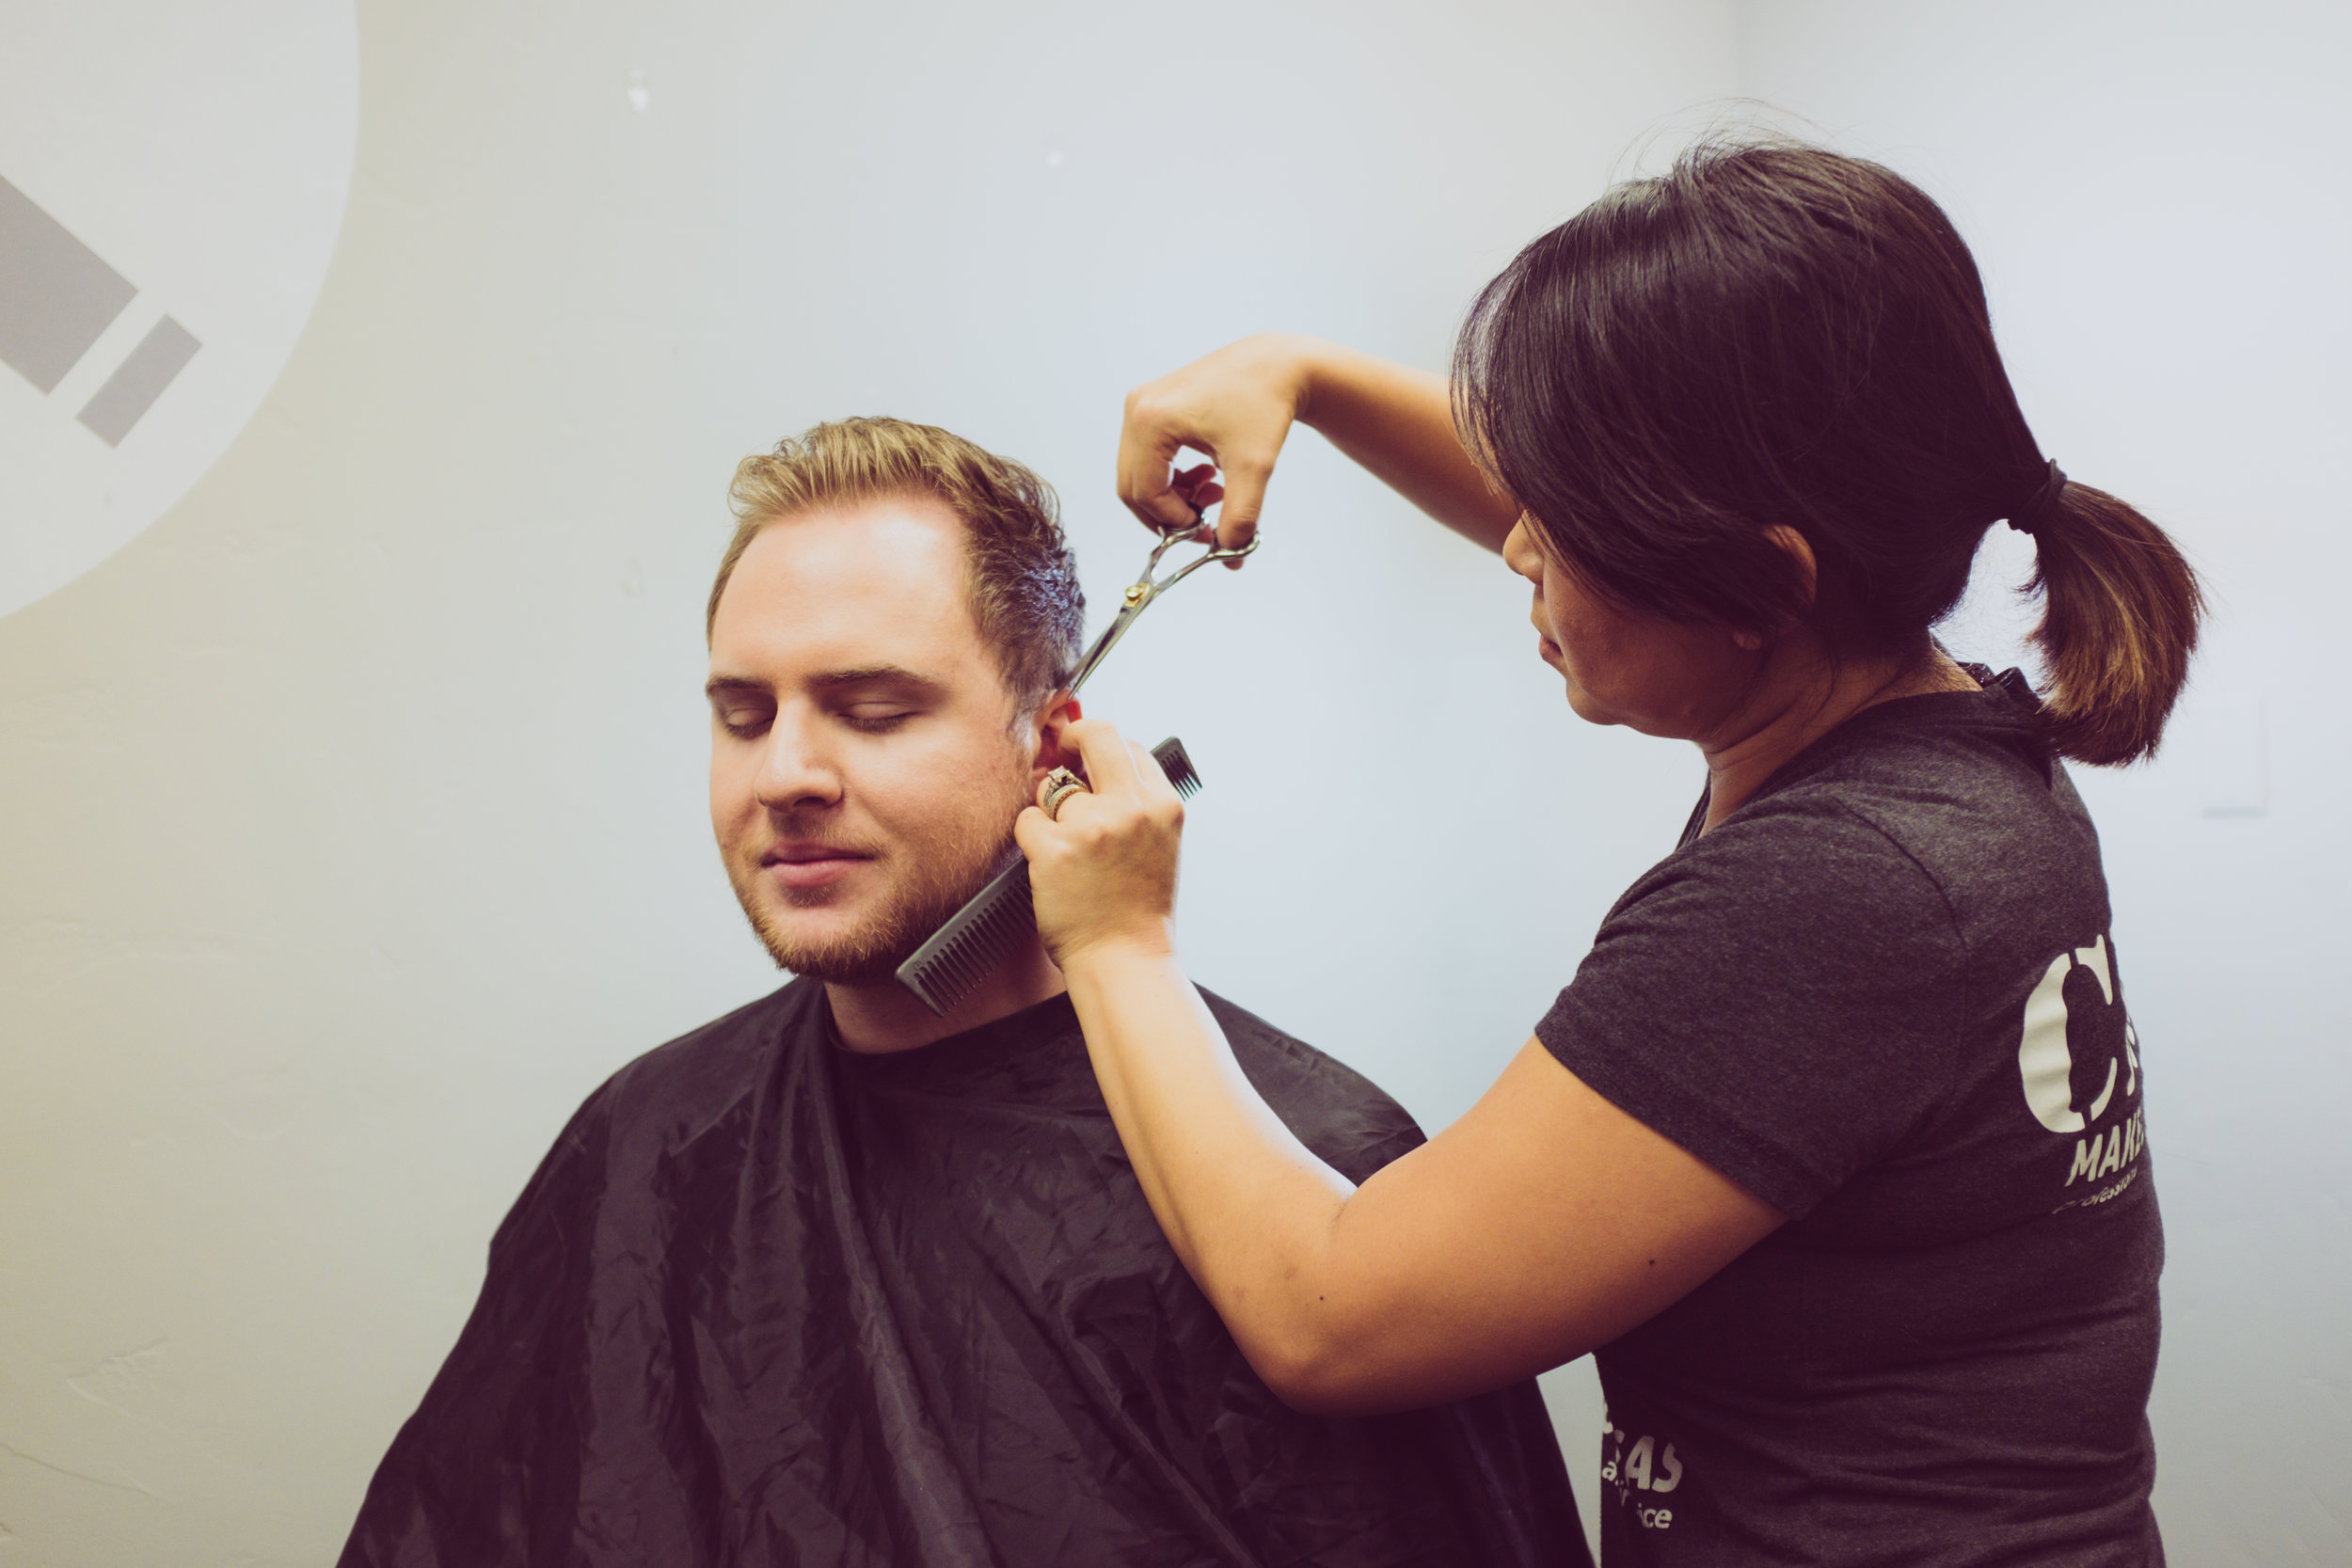 HAIR & SCALP CARE - Shampoo & Conditioner….………...$25Scalp Treatment……………….$60 & up